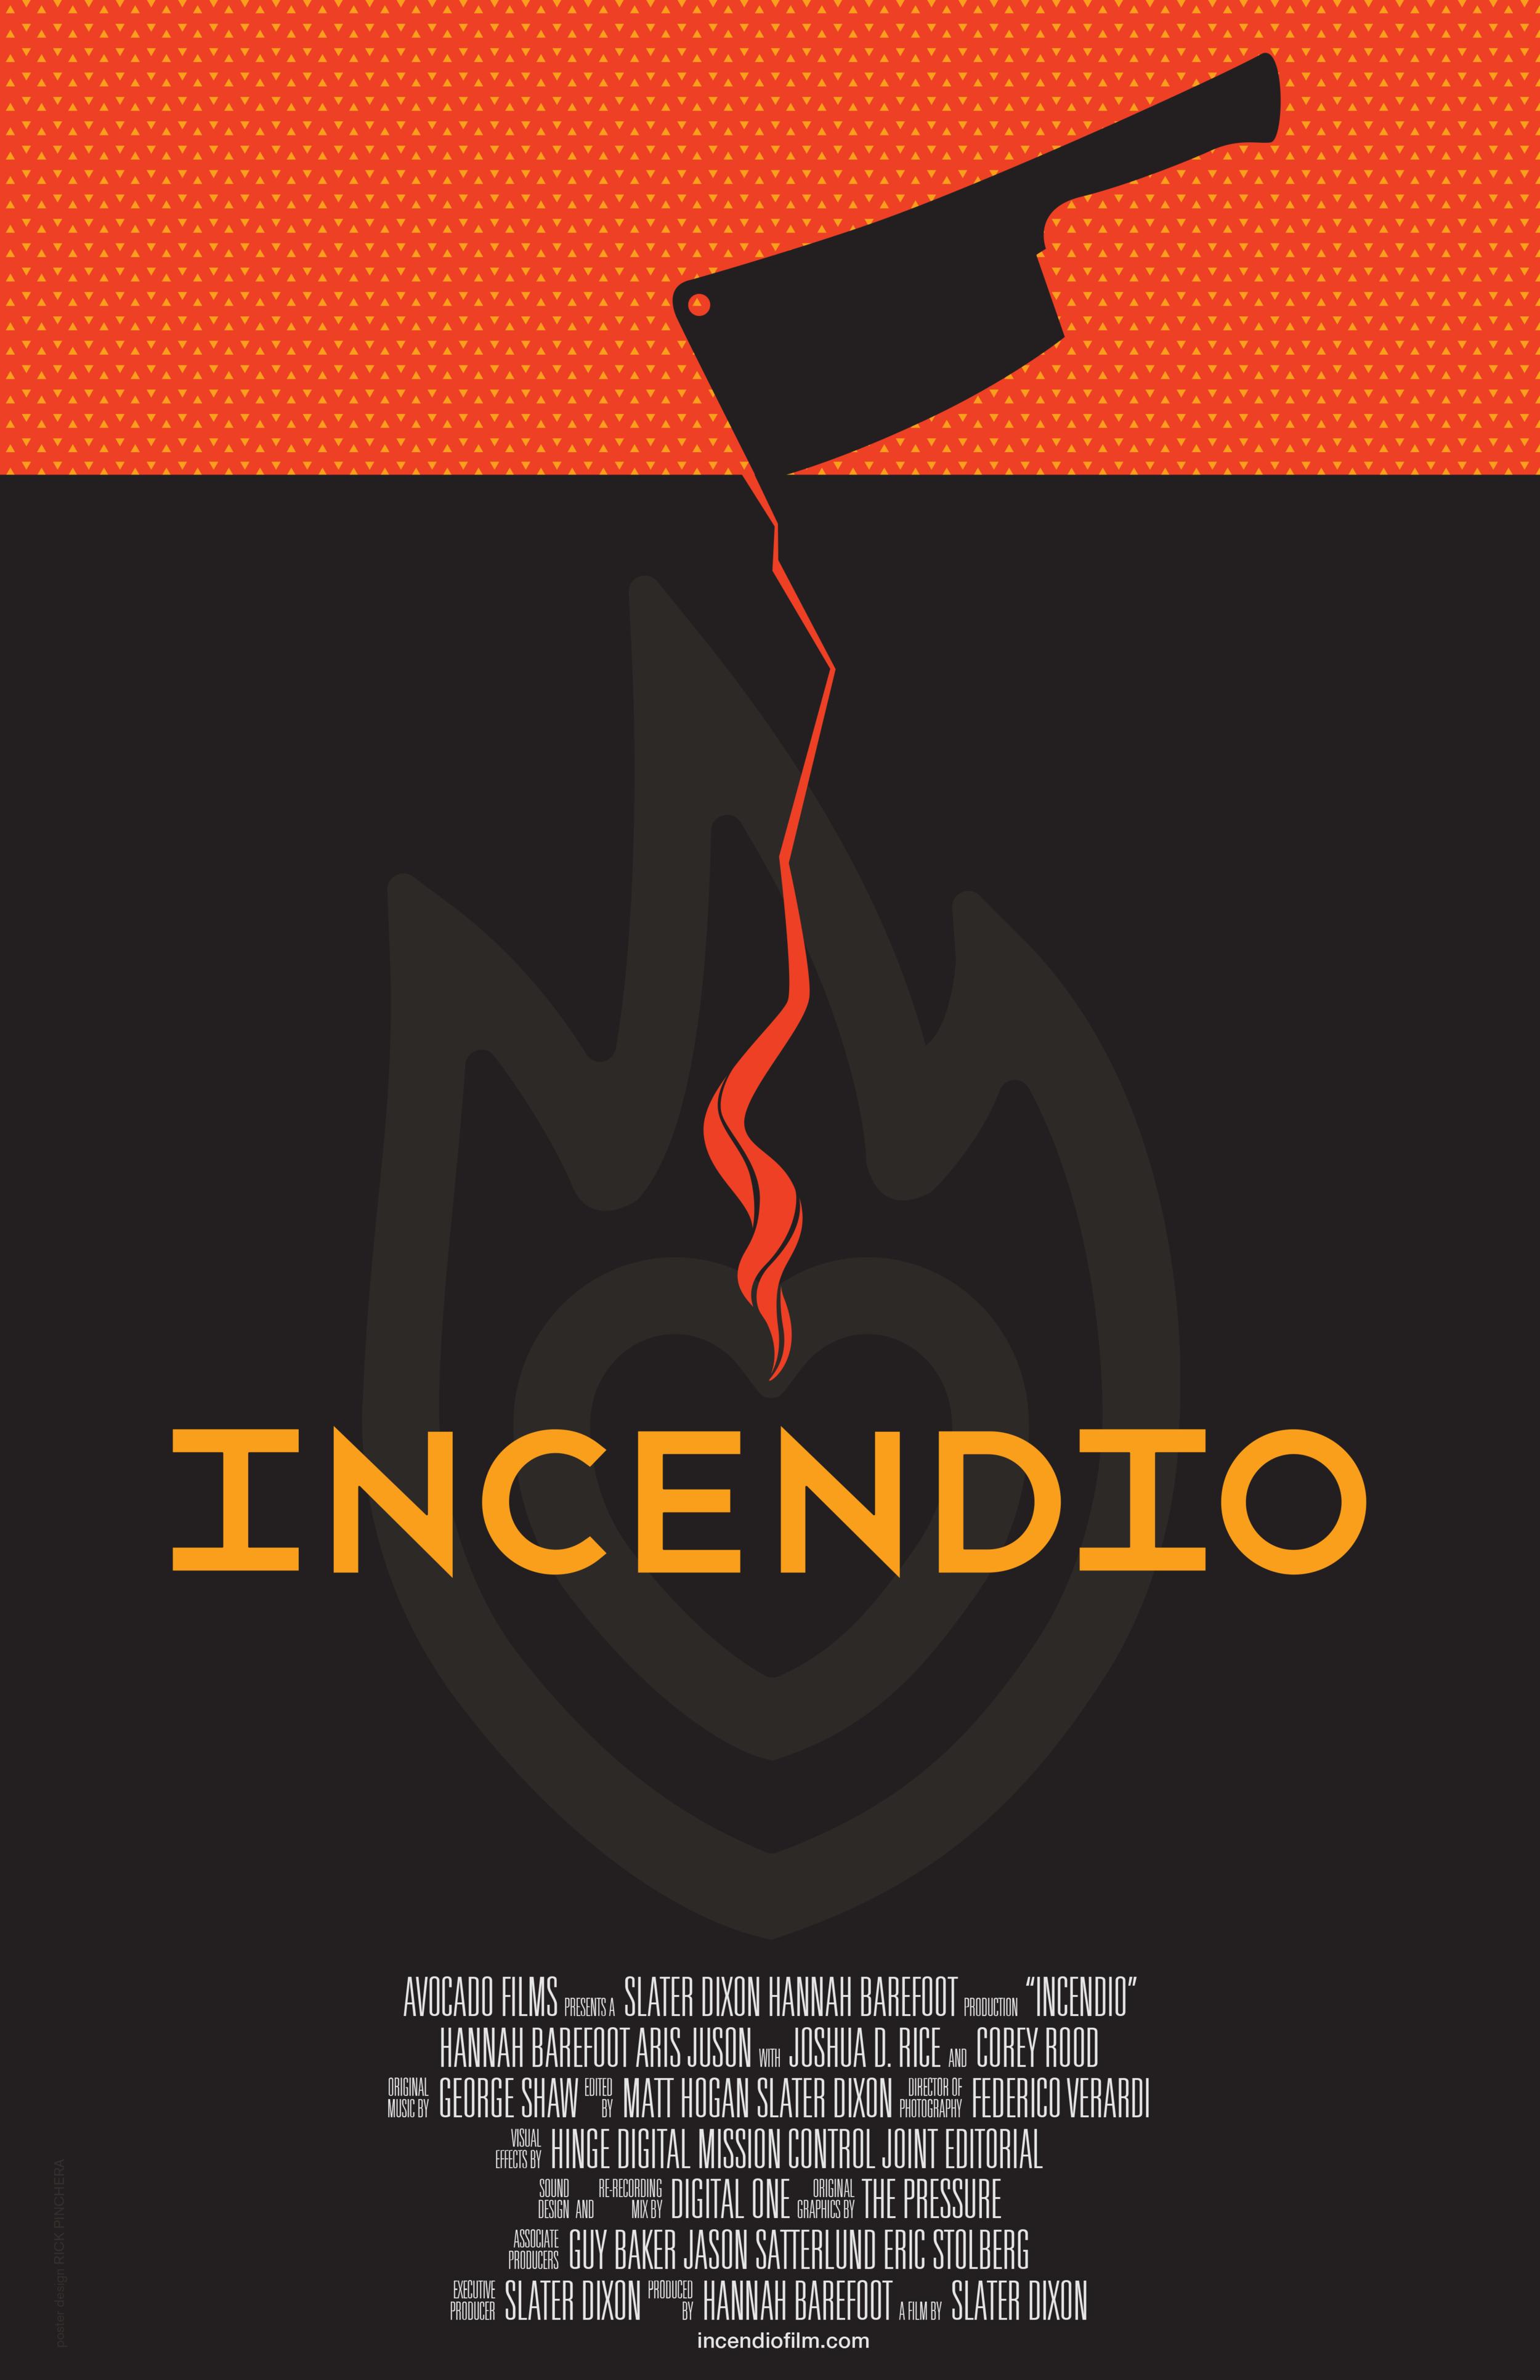 INCENDIO_Poster-01.png